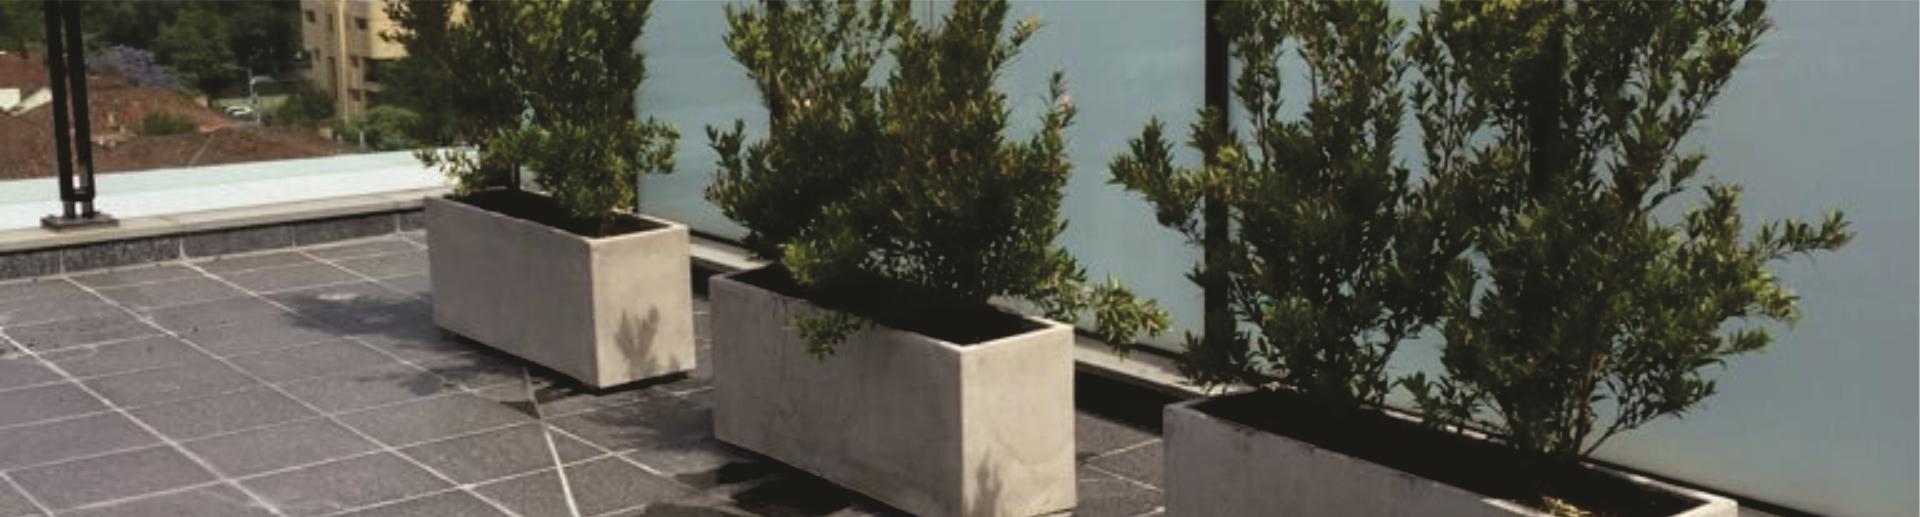 Zenith Home Garden Decor Ebay Stores Home Decorators Catalog Best Ideas of Home Decor and Design [homedecoratorscatalog.us]